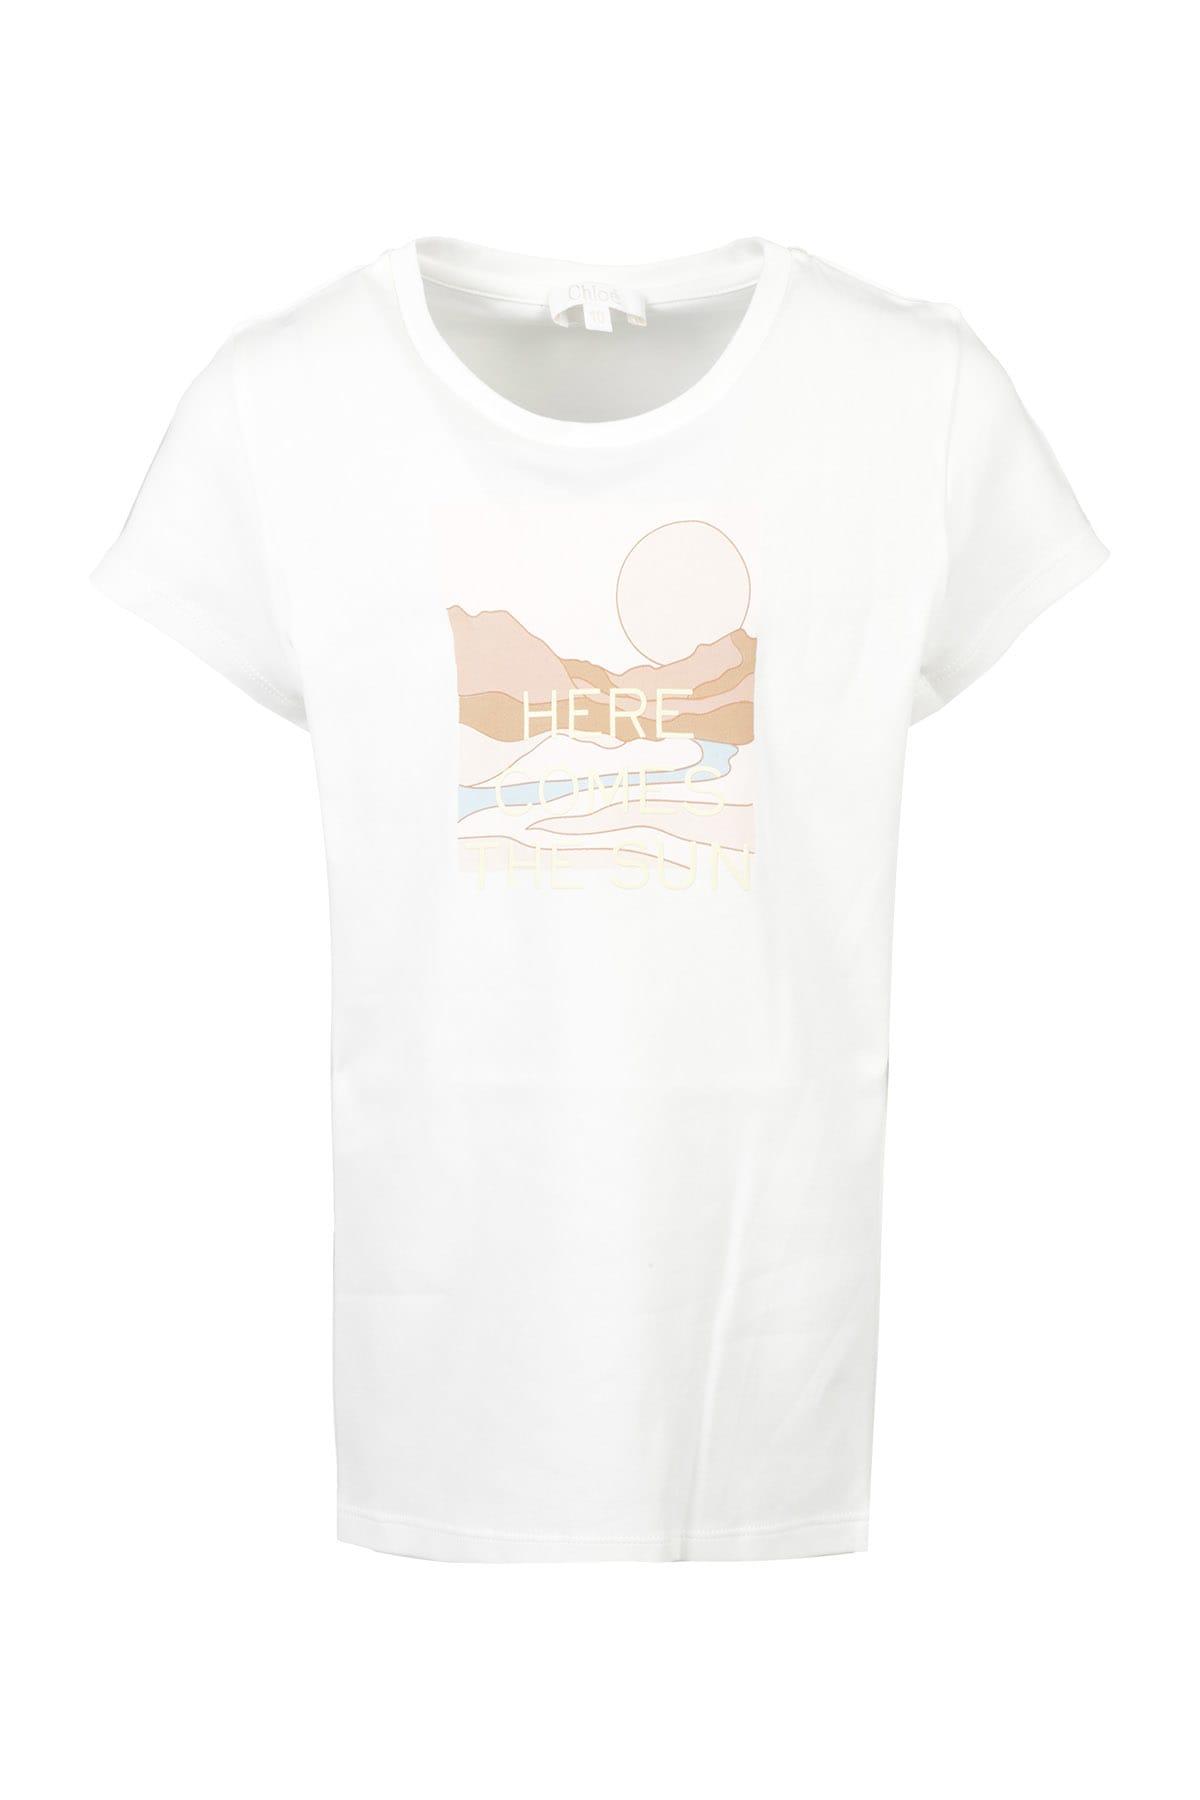 Chloé Kids' T-shirt In Bianco Sporco